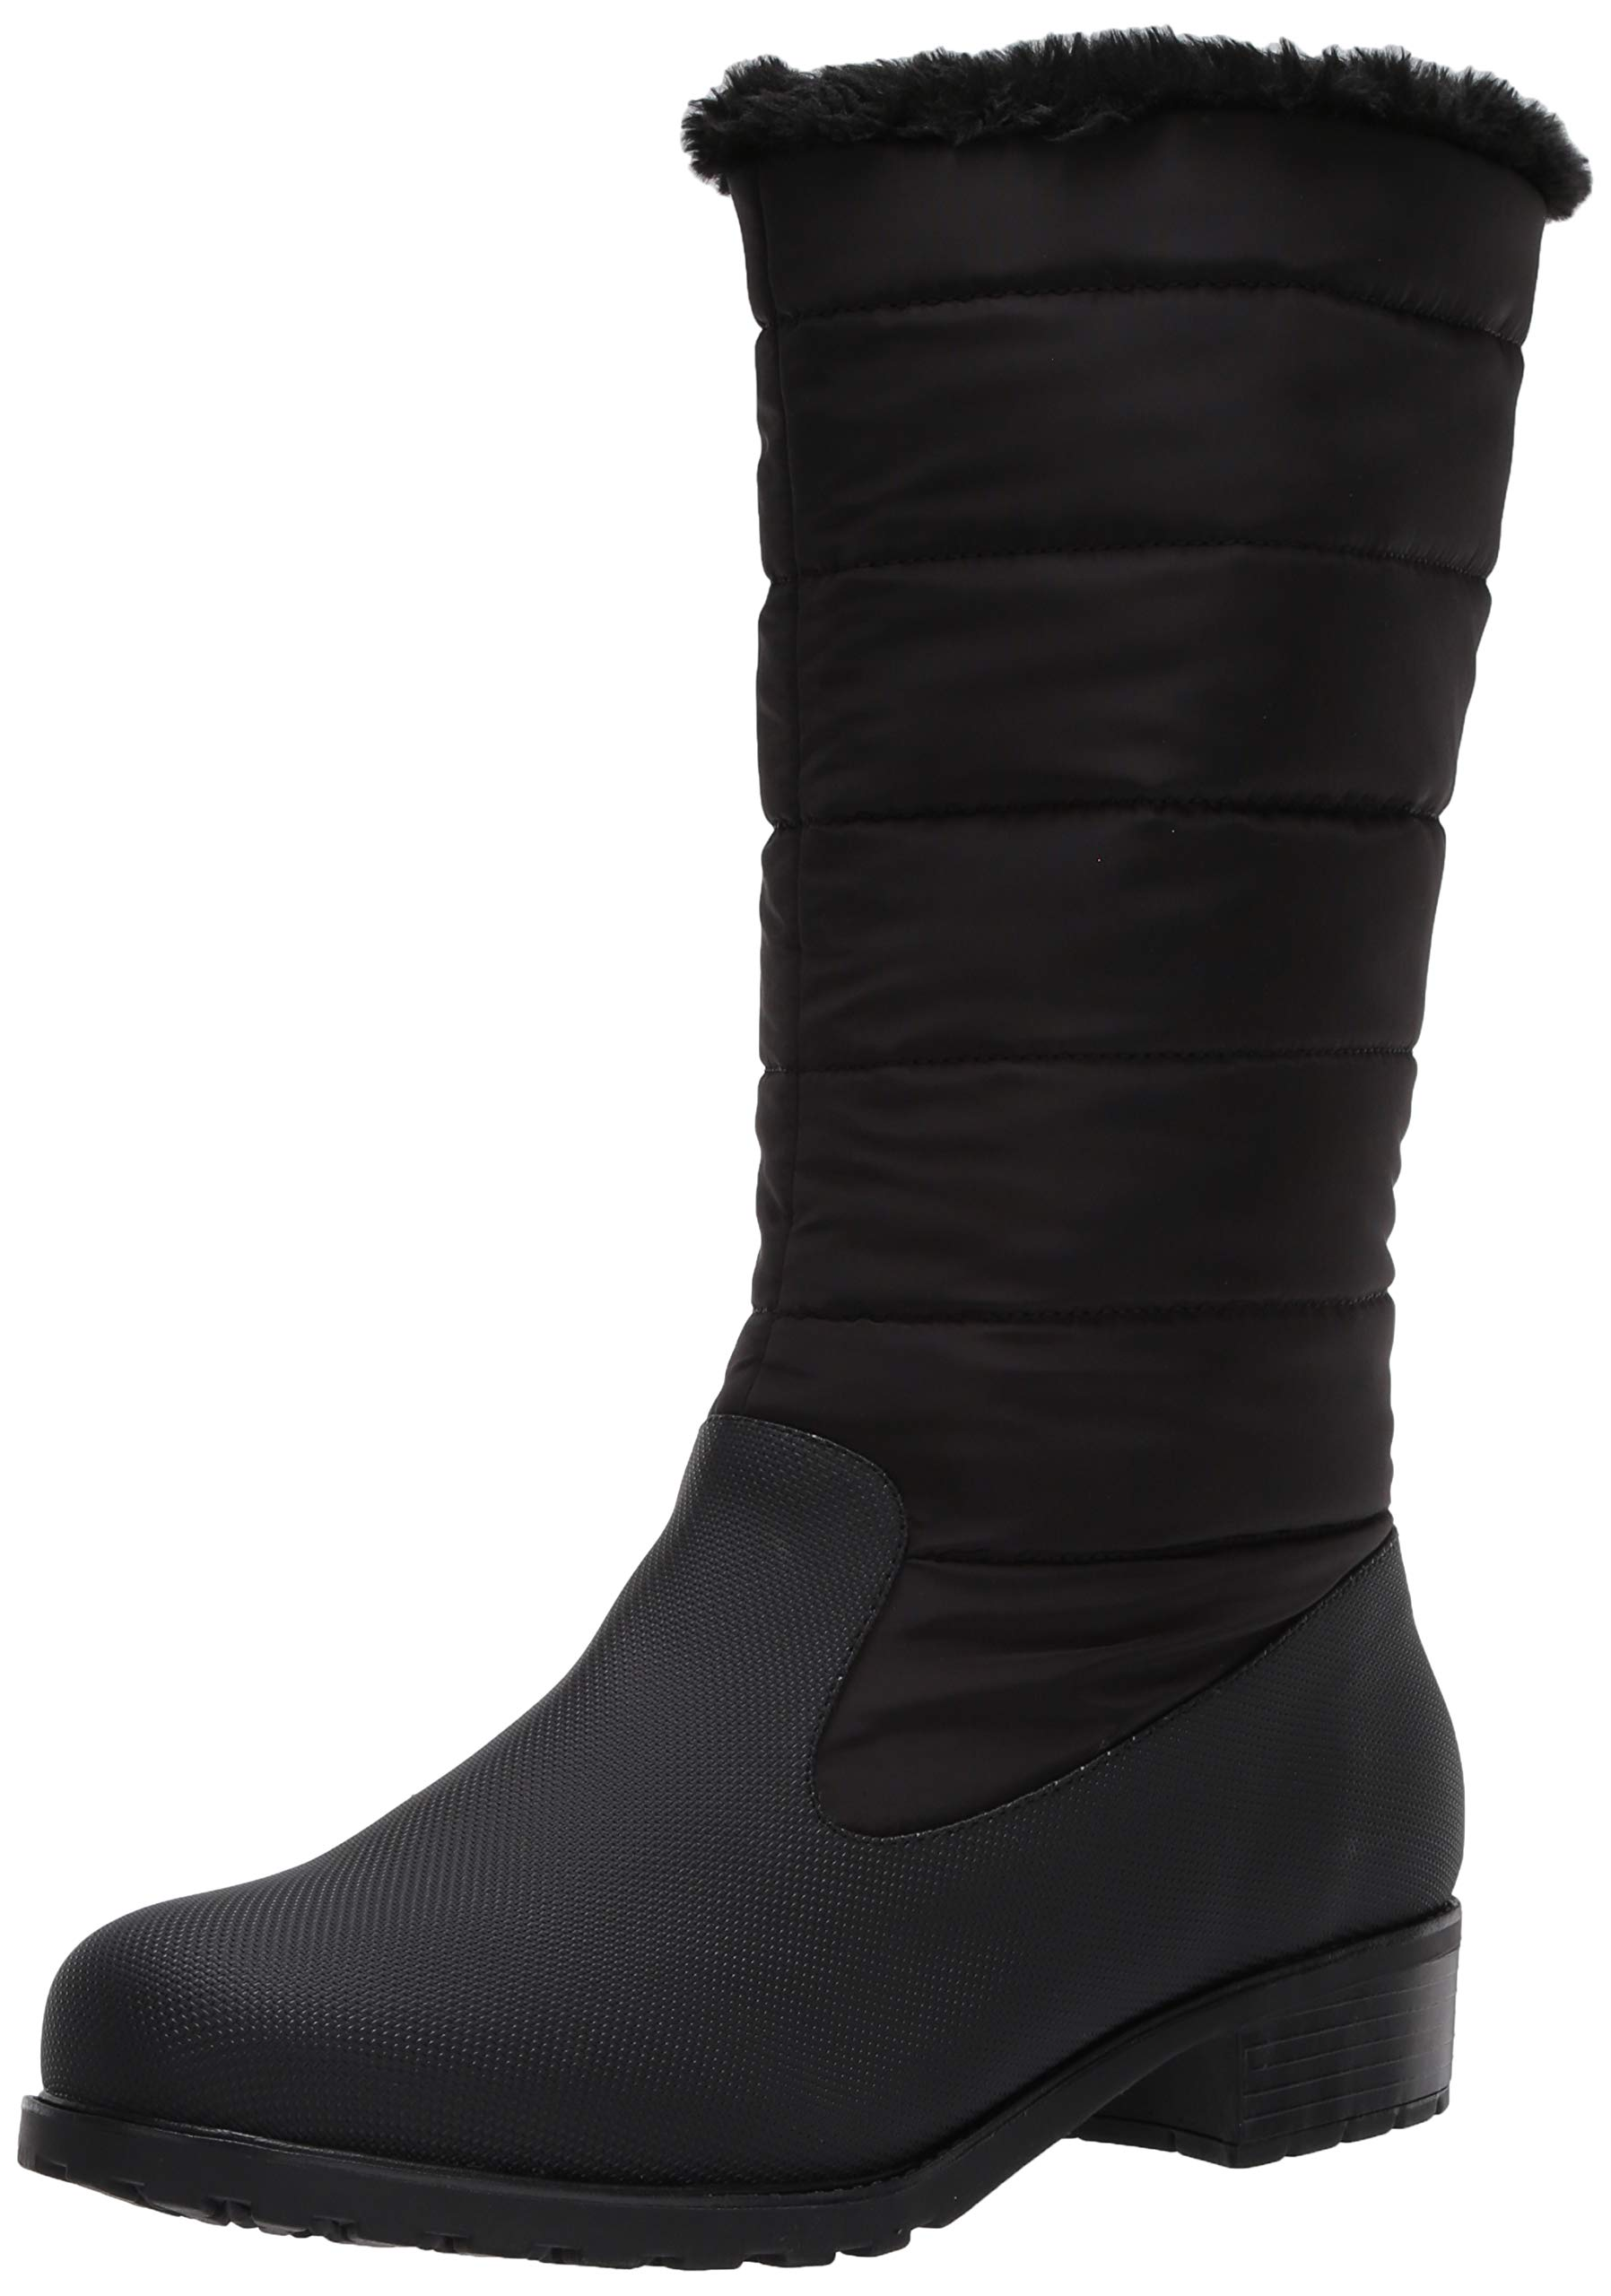 Trotters Women's Benji High Mid Calf Boot